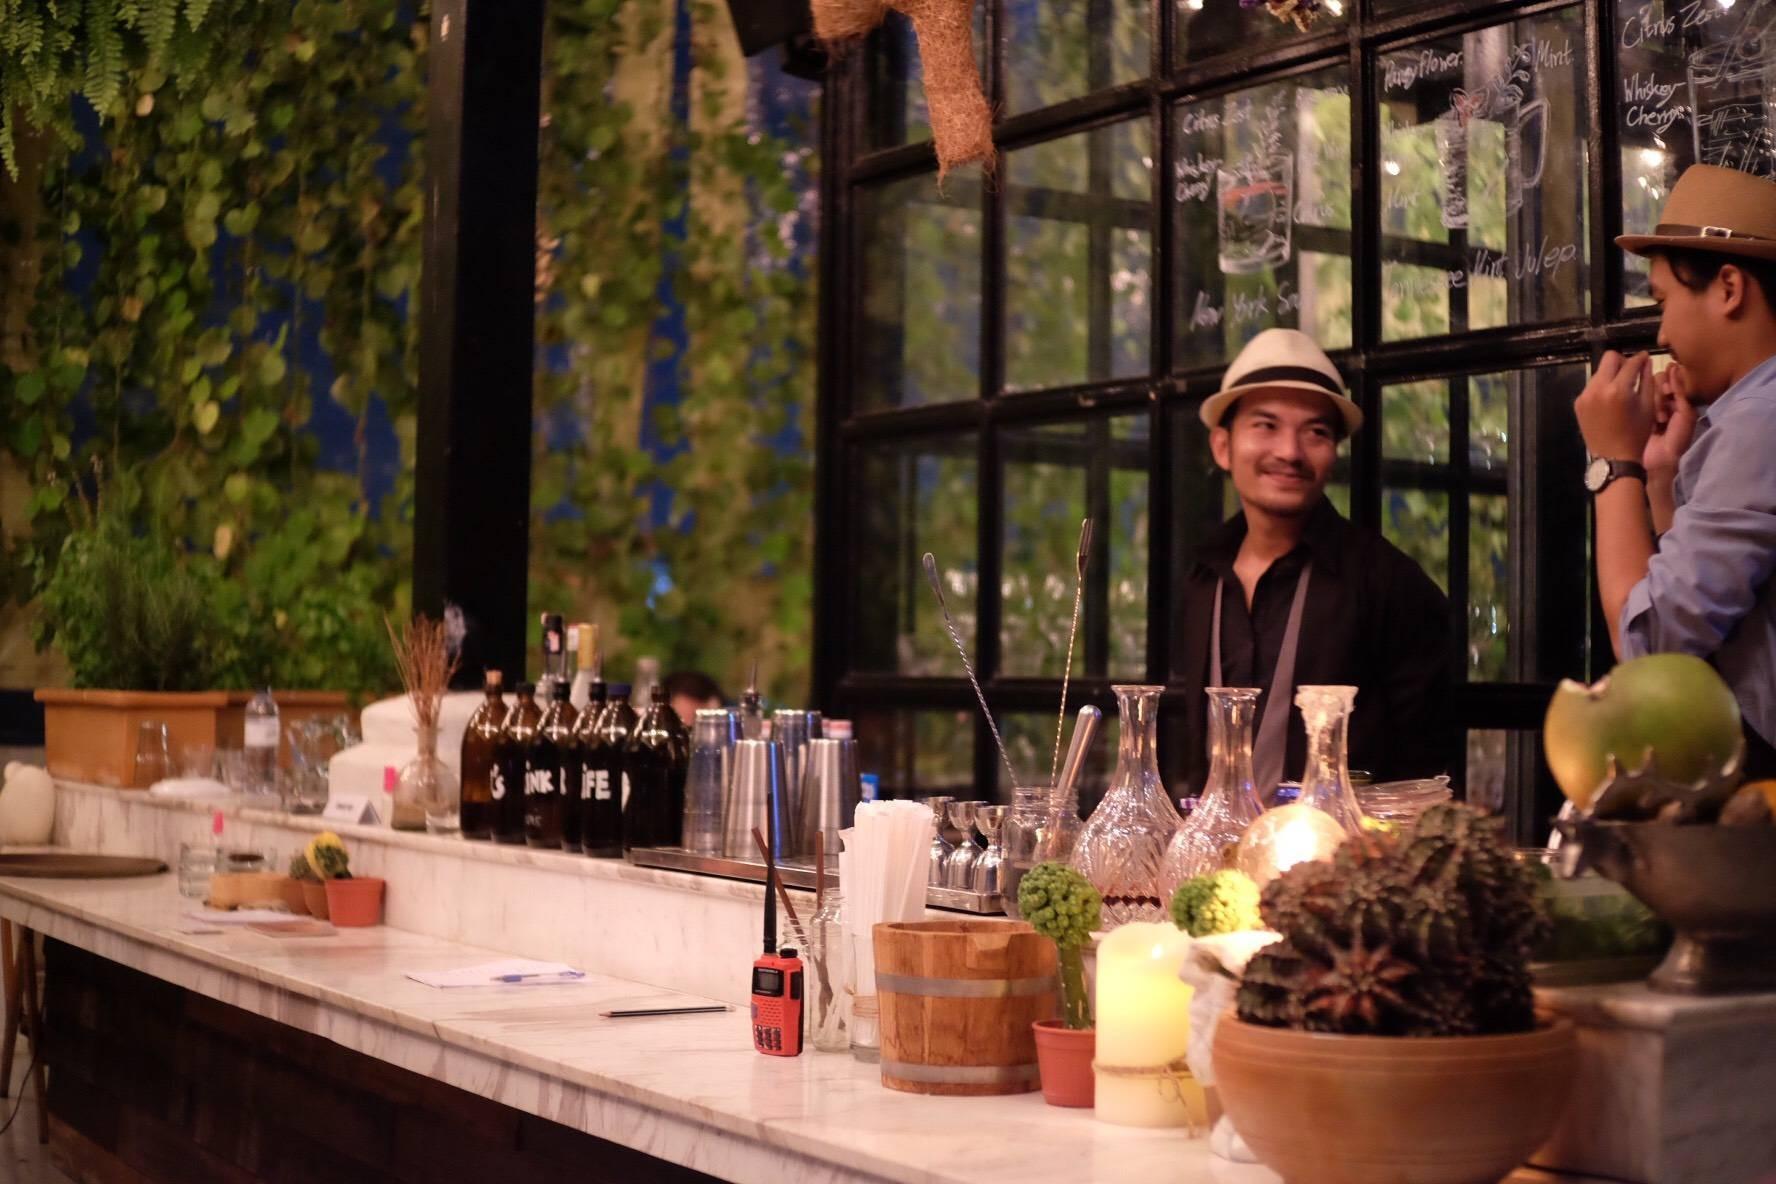 Hotel yayee (Roof Top Bar&Coffee Shop)